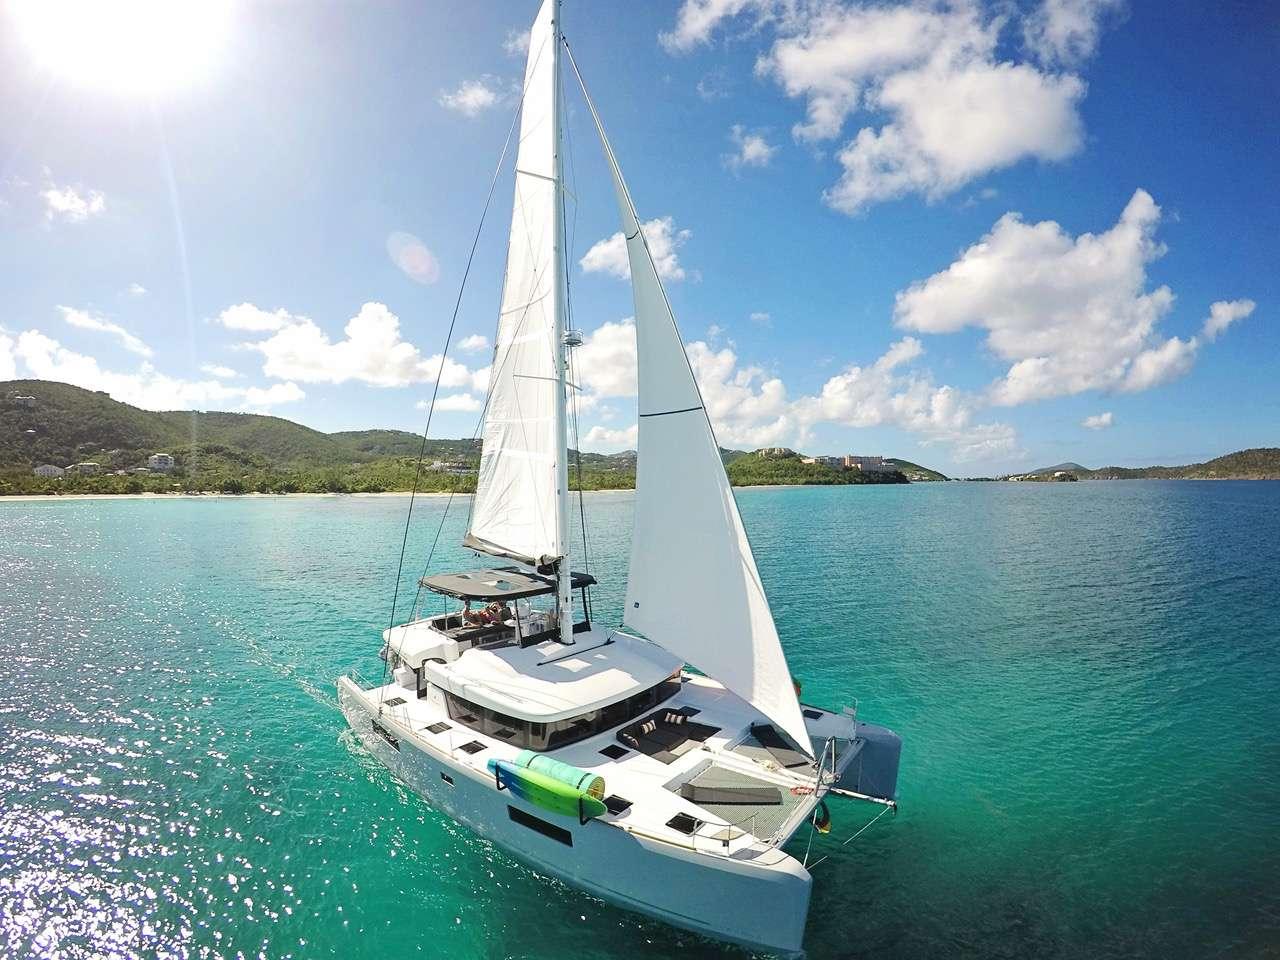 52' Lagoon in the Caribbean